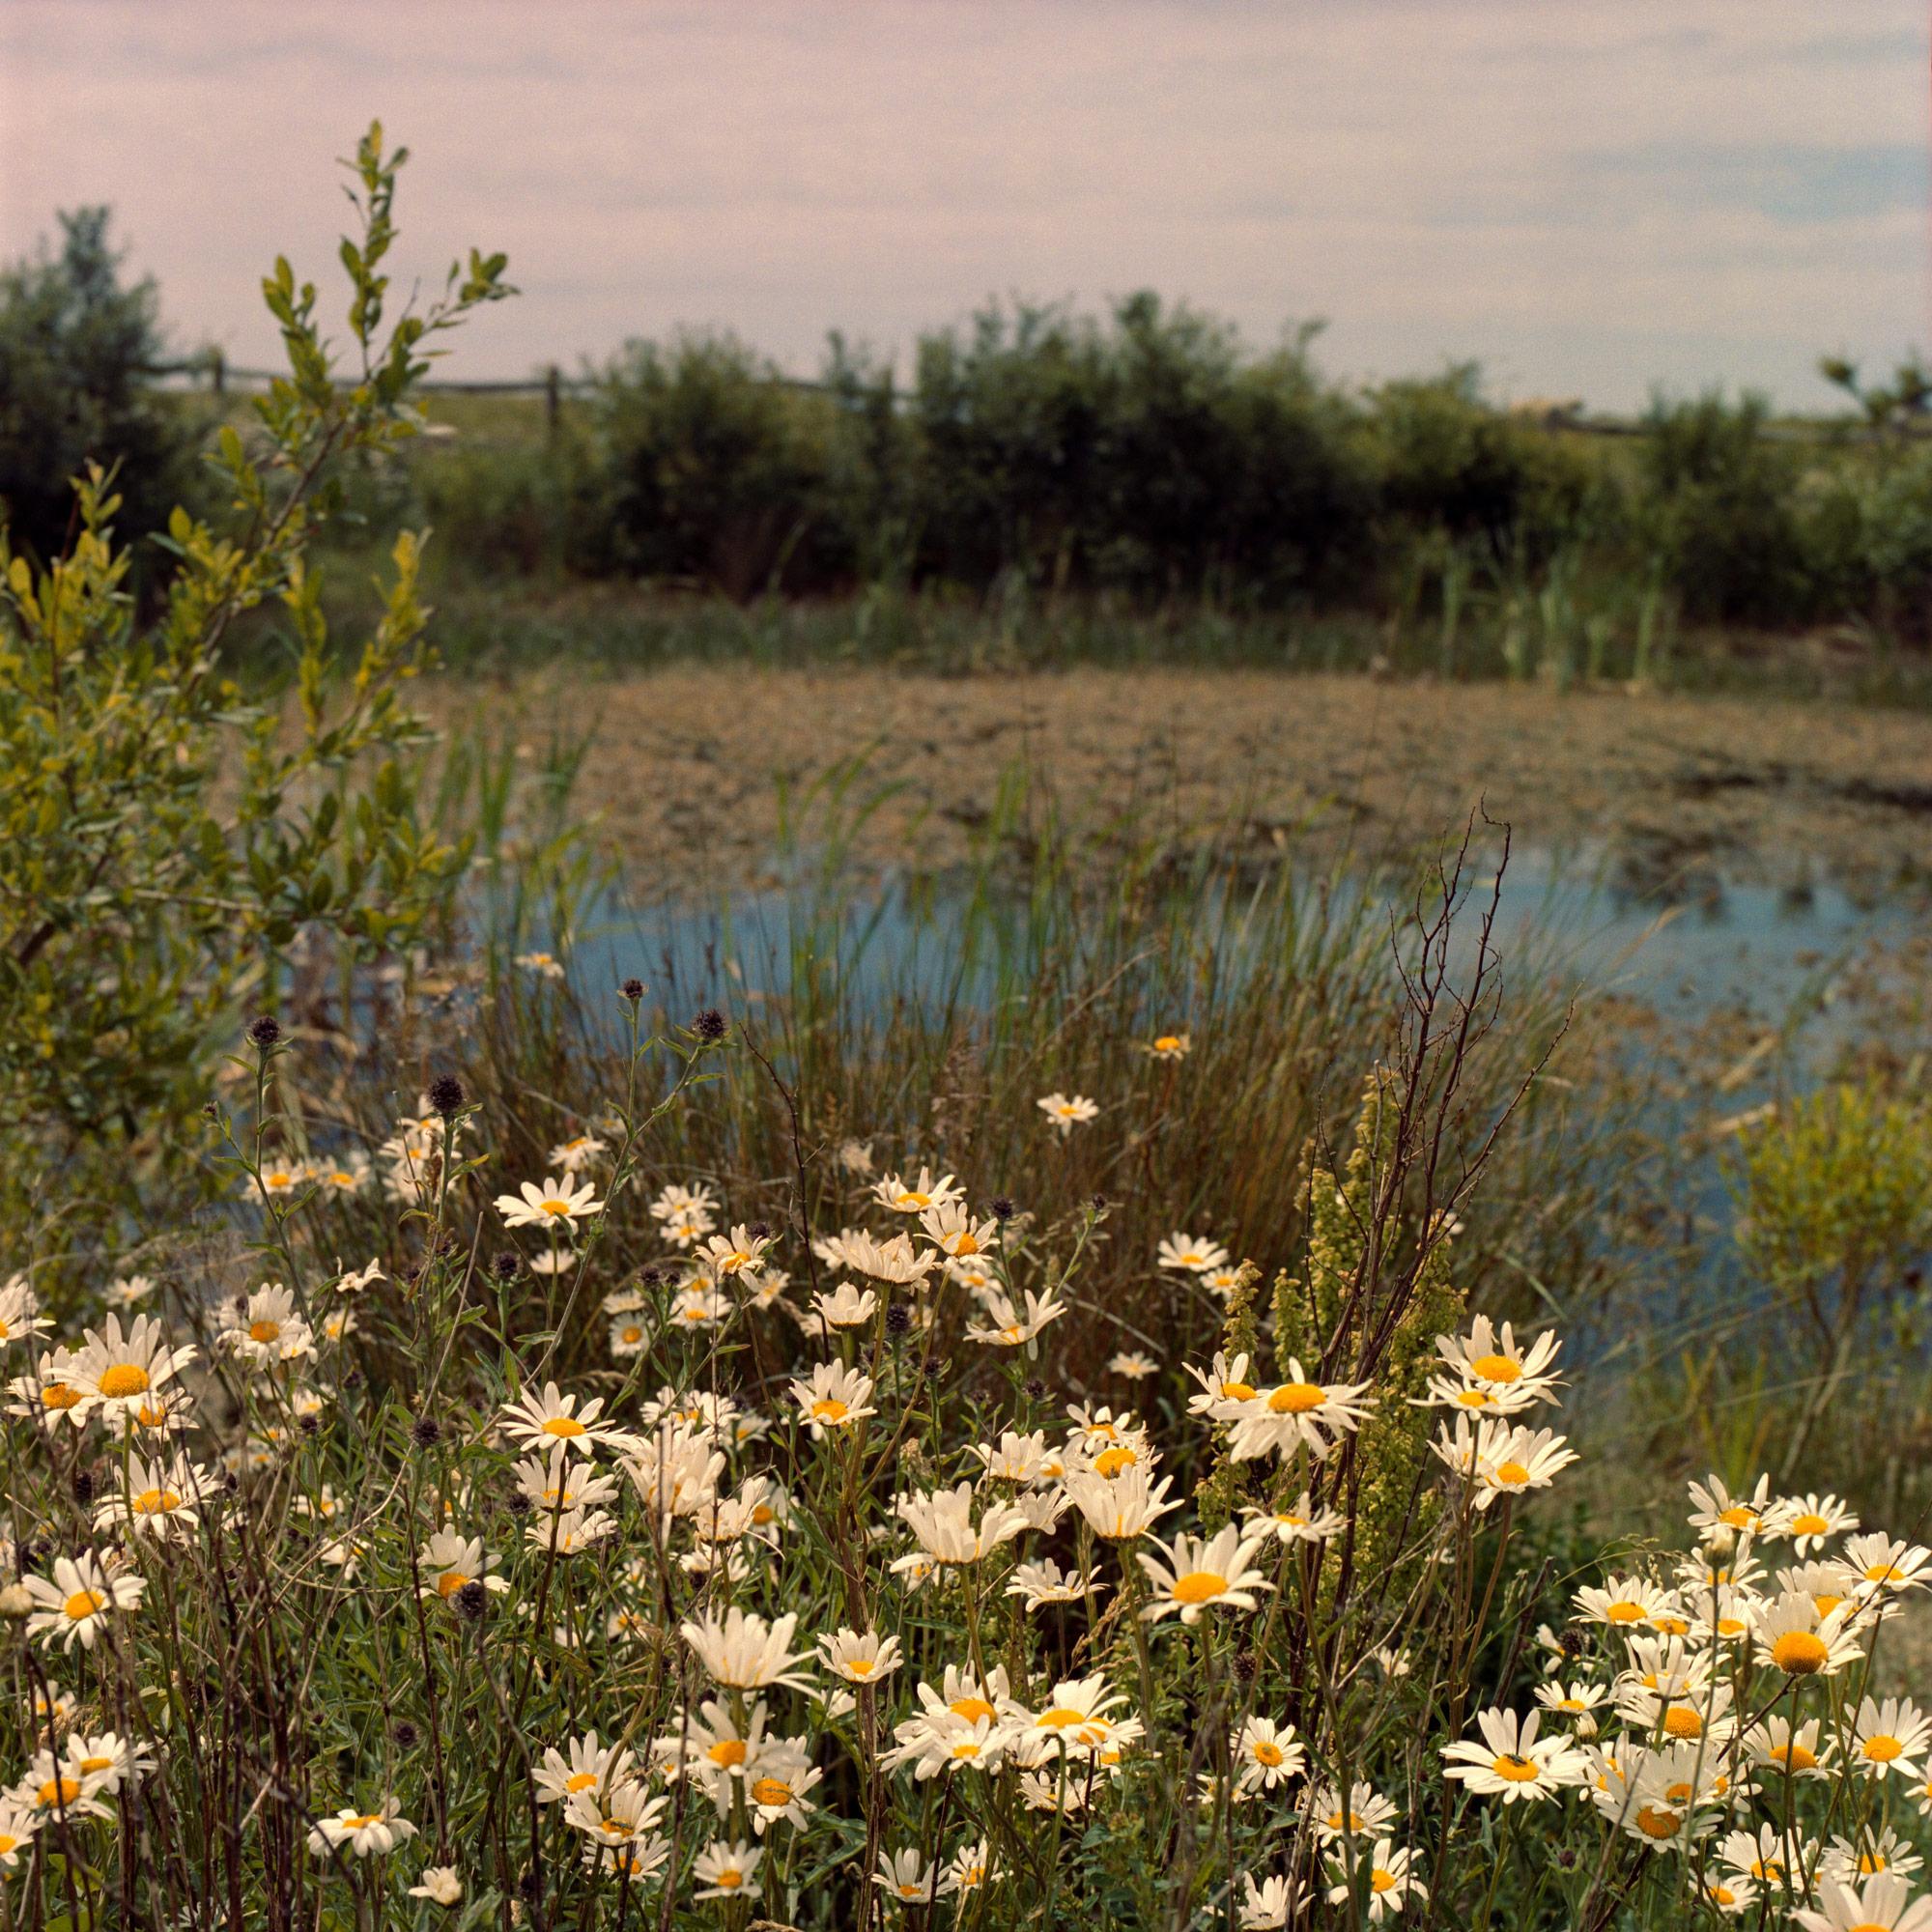 Daisy Pond, landscape on film by ioannis koussertari